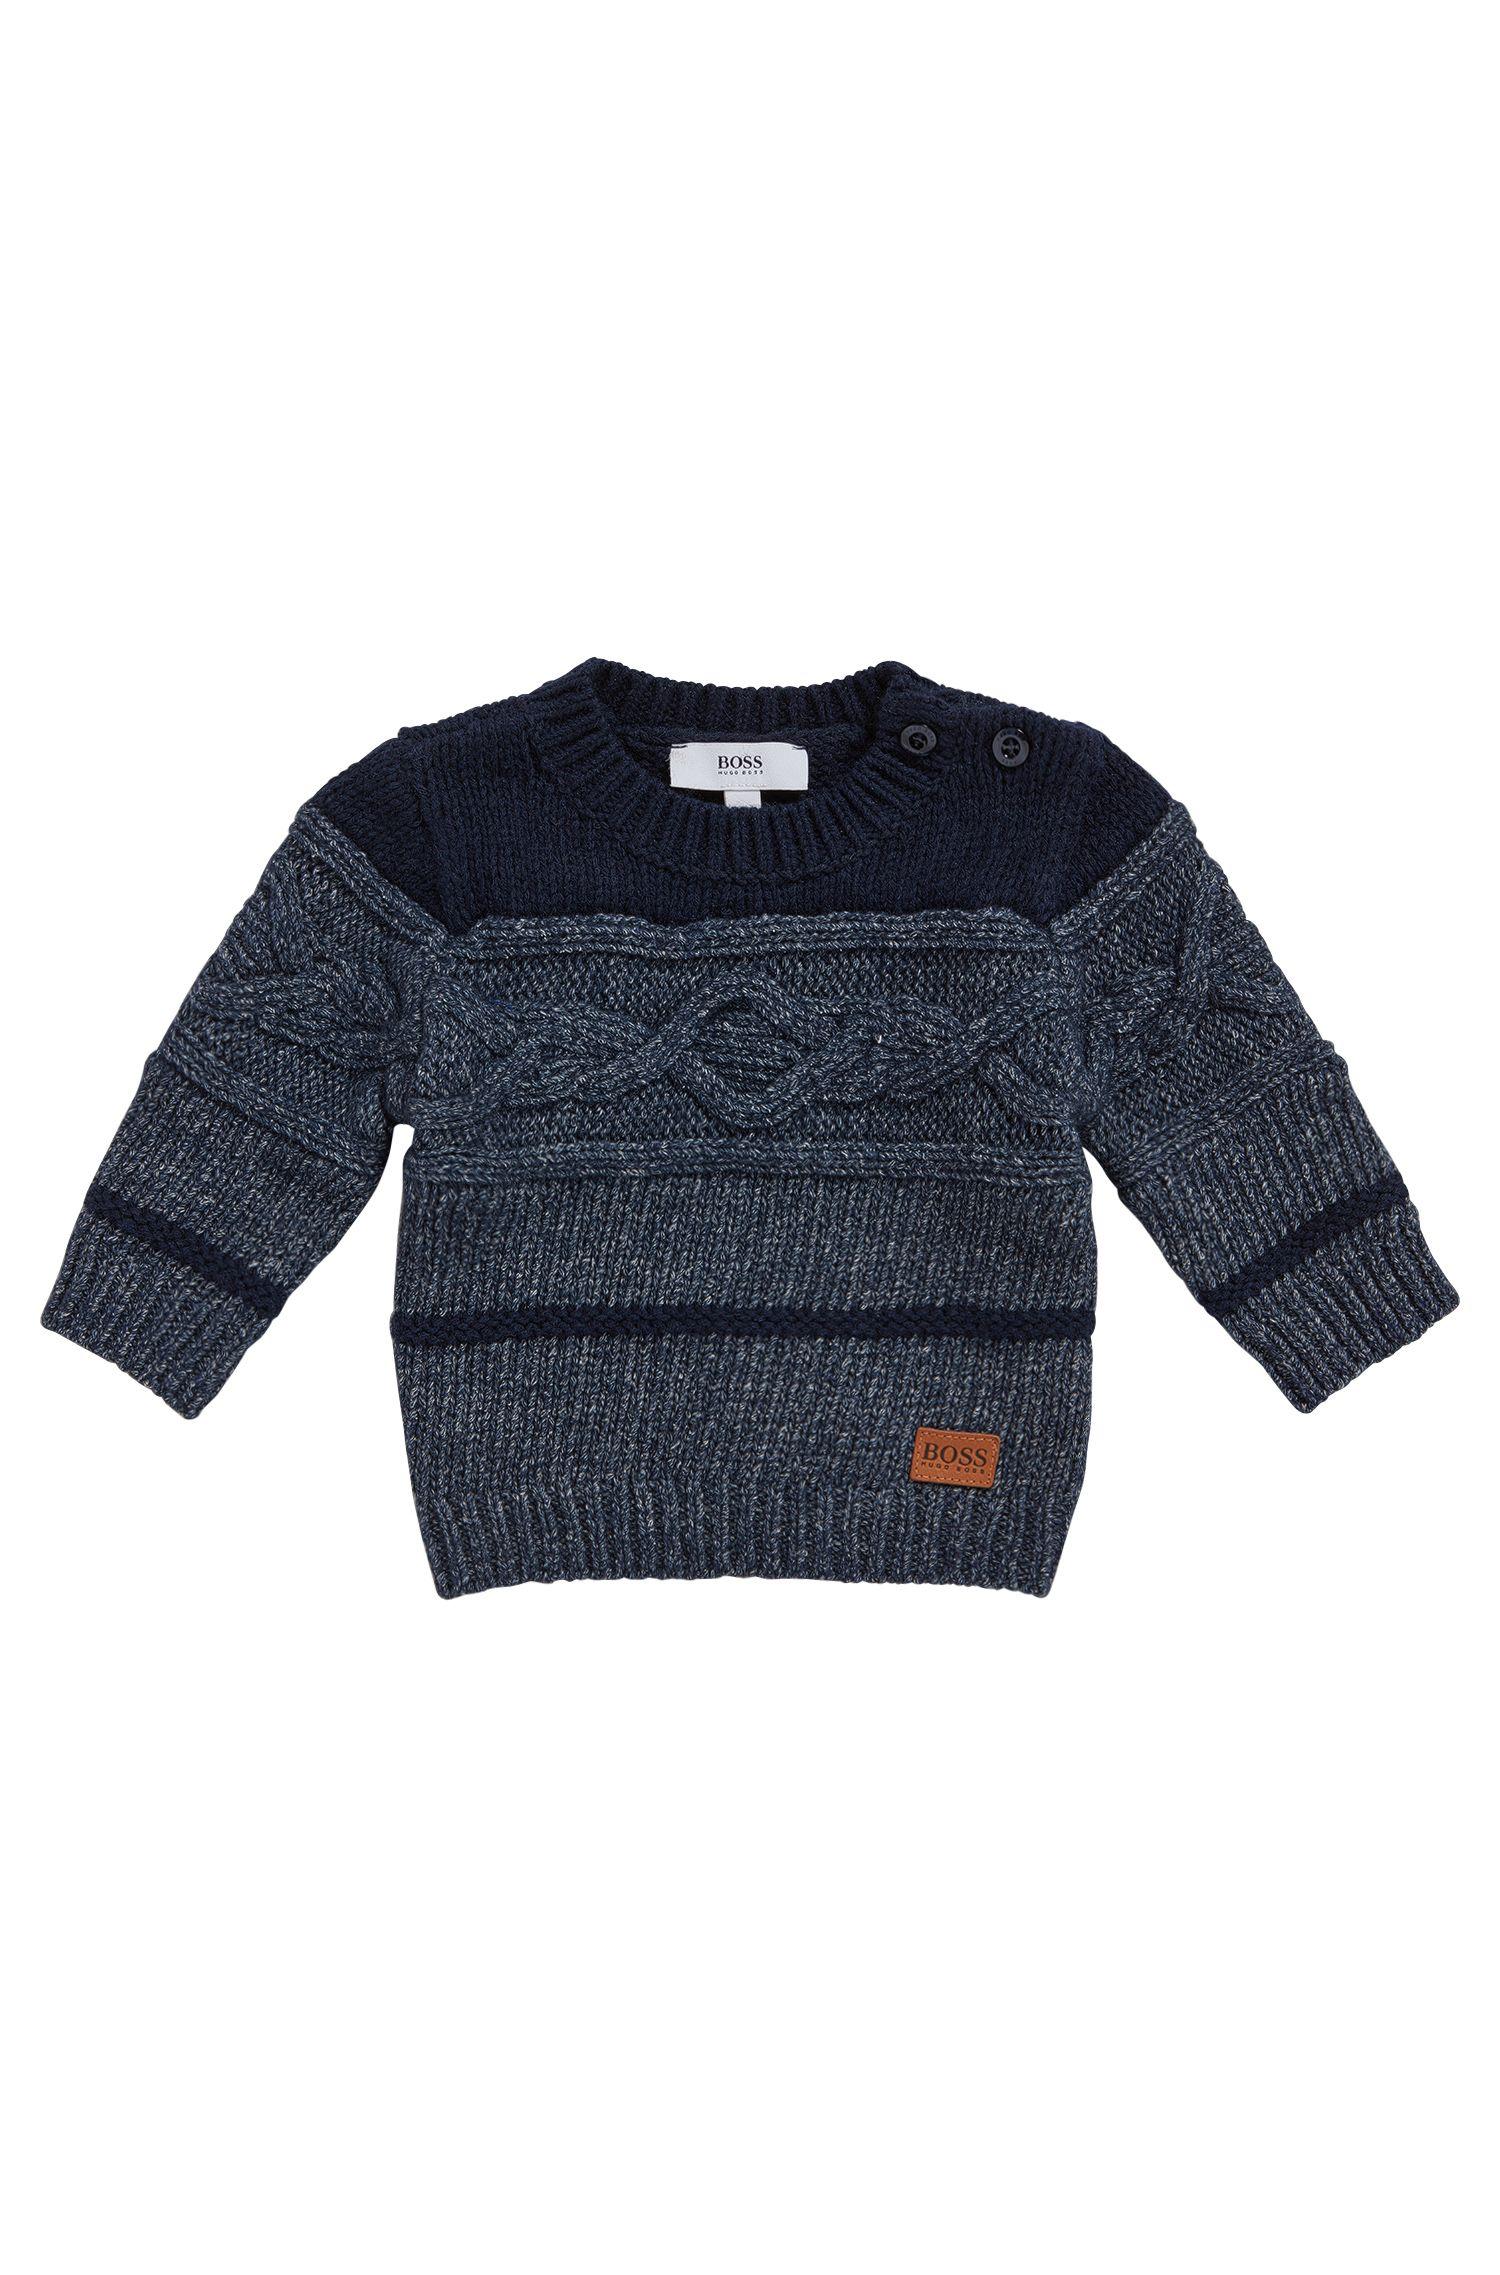 'J05516'   Toddler Stretch Cotton Blend Patterned Sweater